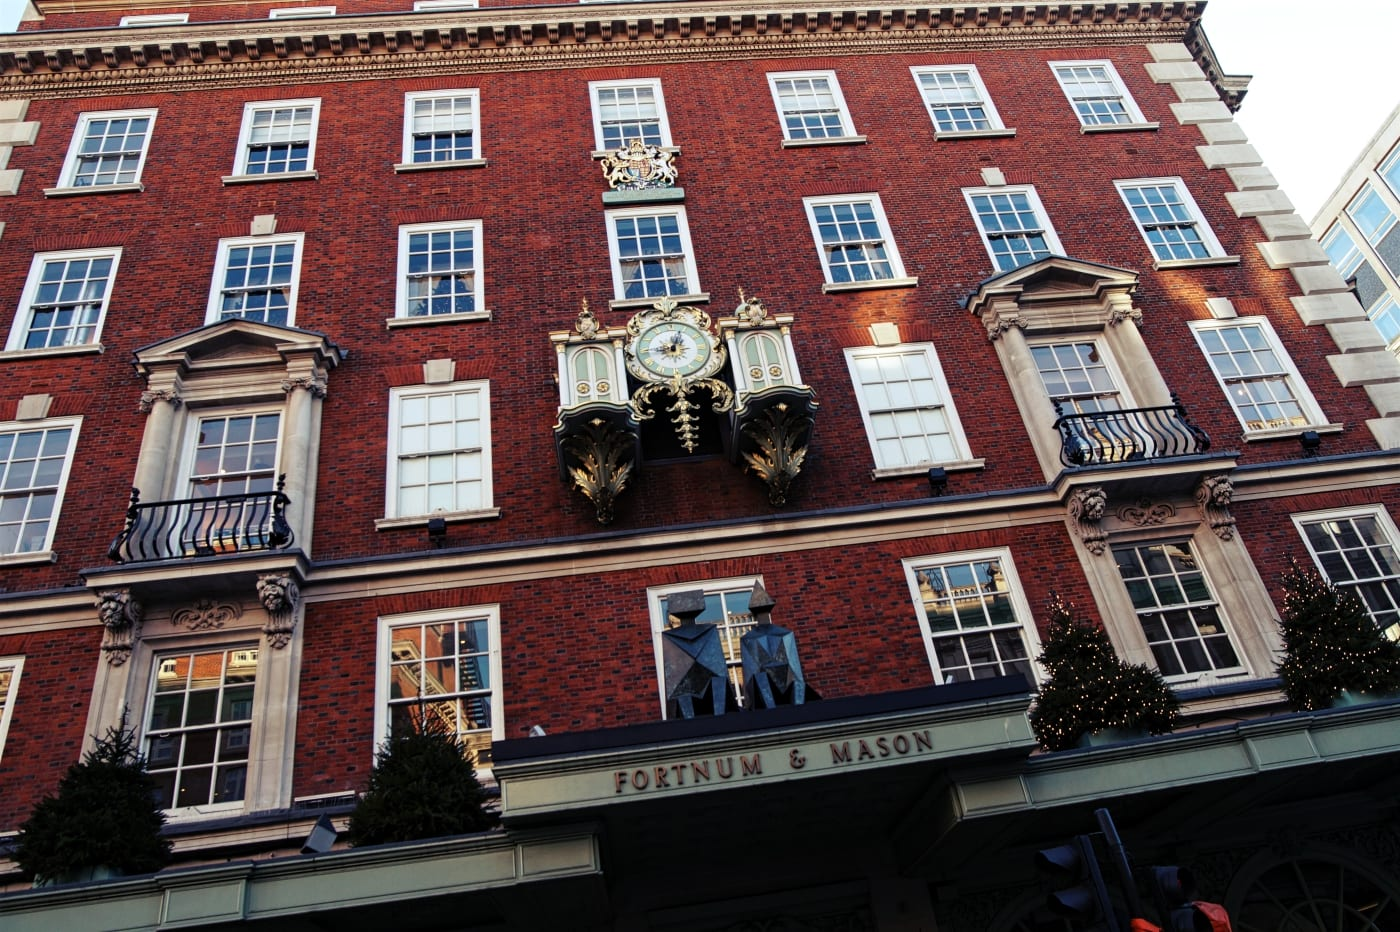 Die berühmte Uhr an der Fassade.